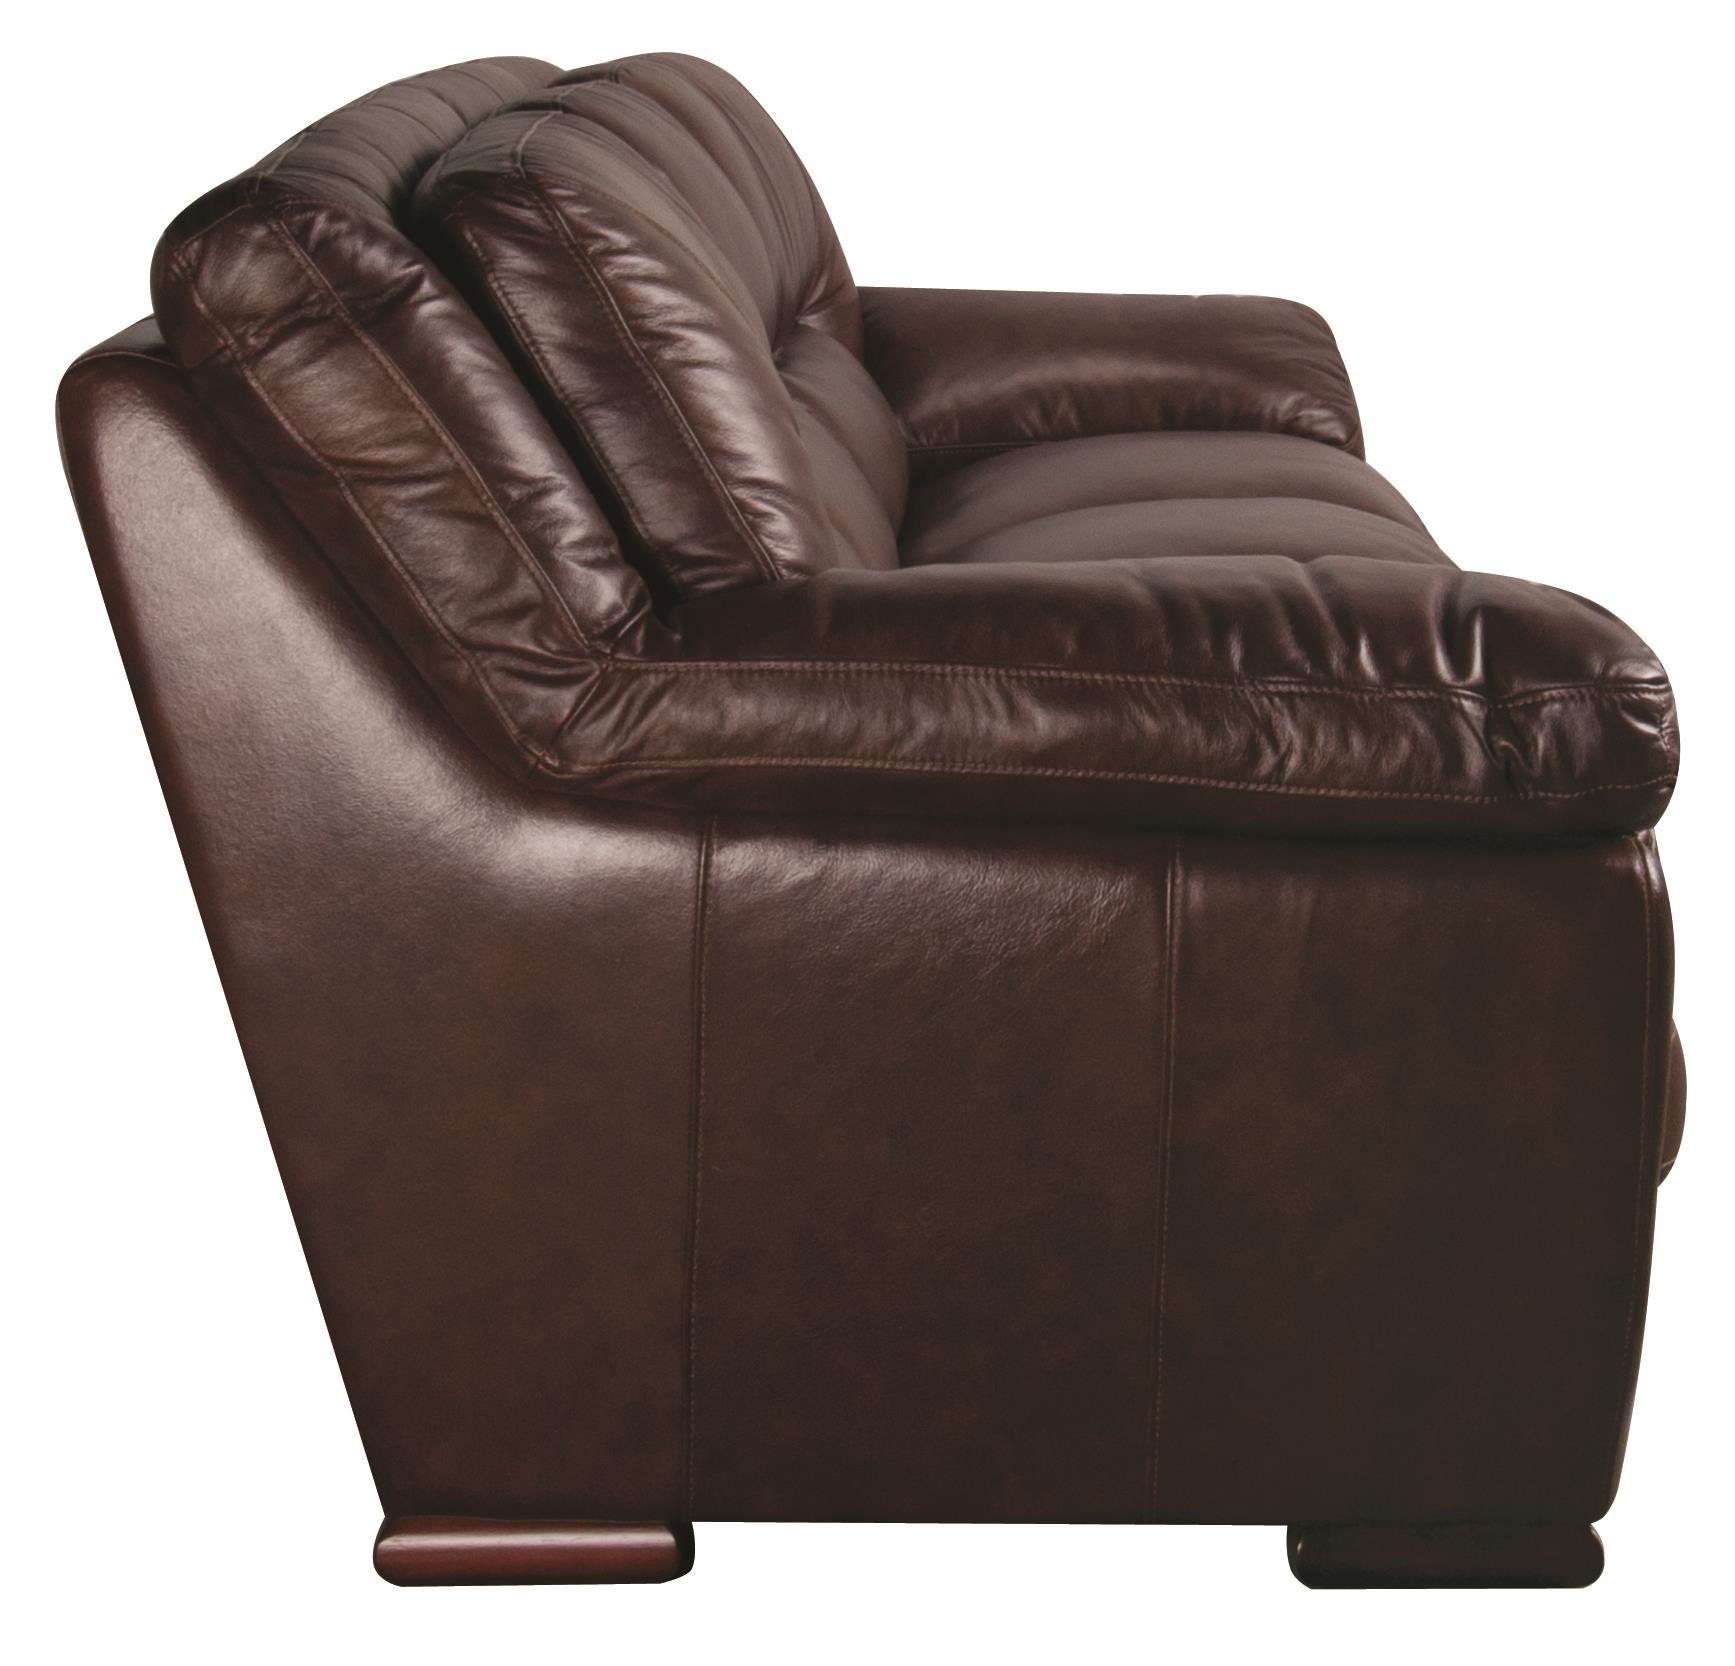 ... Morris Home Furnishings AustinAustin 100% Leather Sofa ...